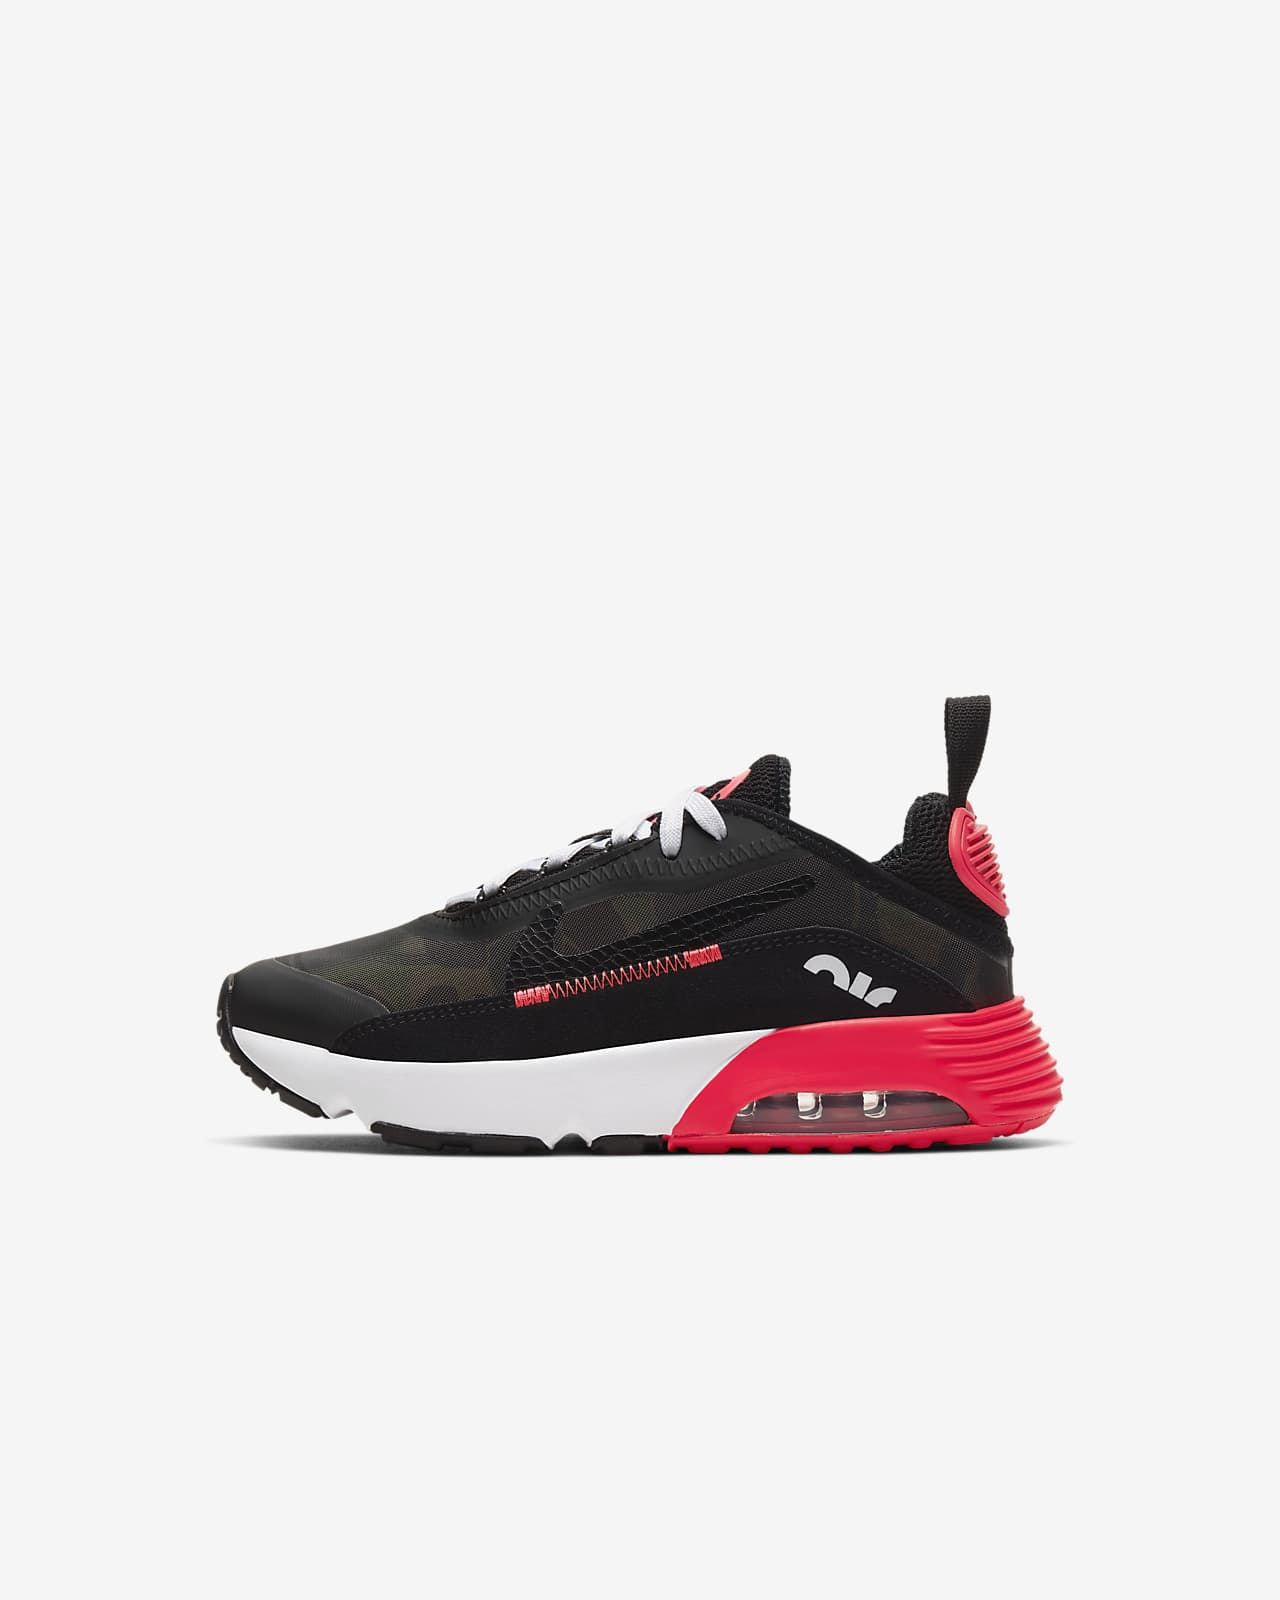 nike shoes under 7000